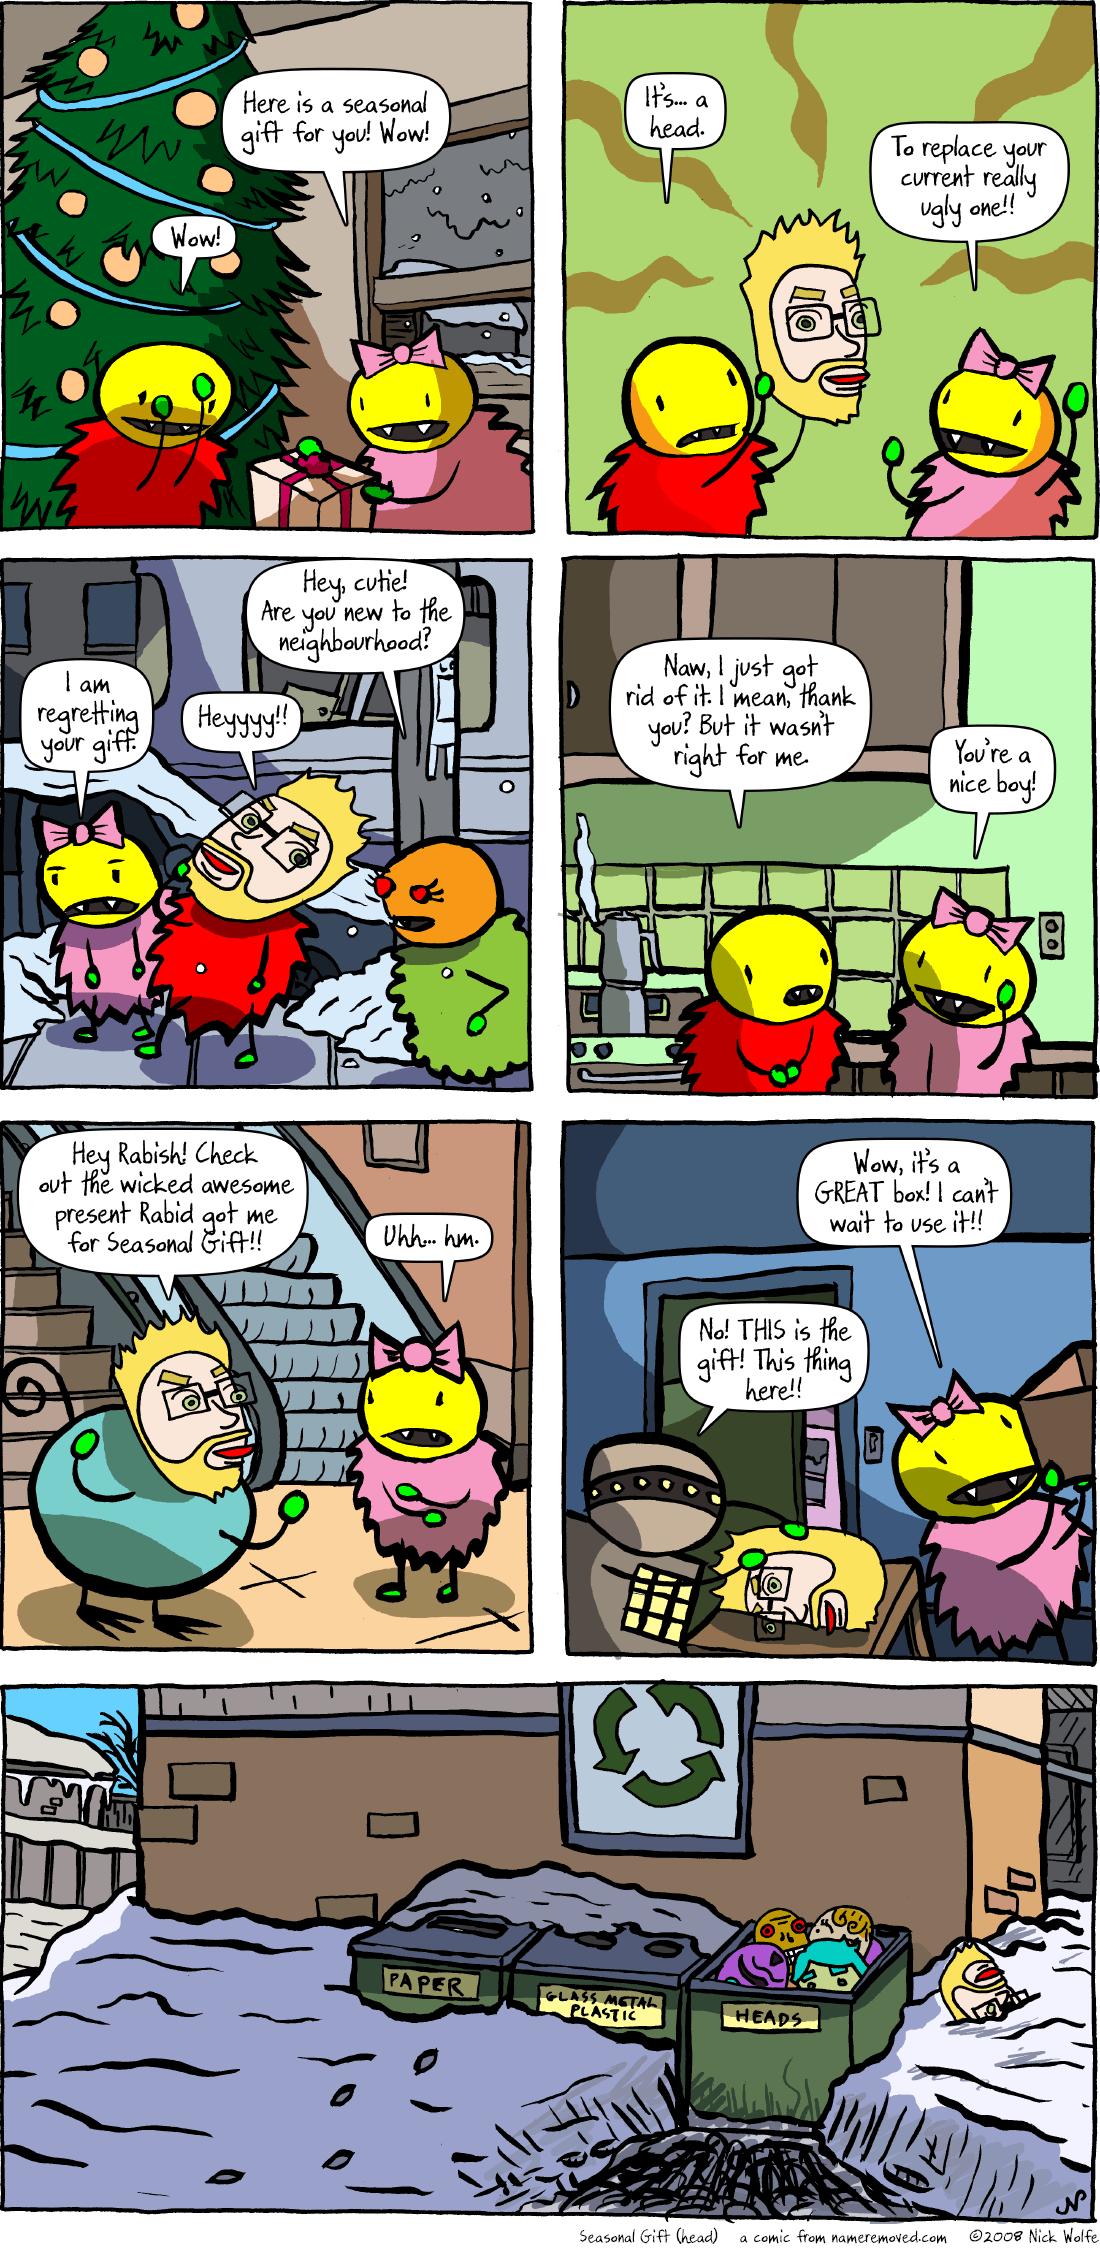 Seasonal Gift (head)